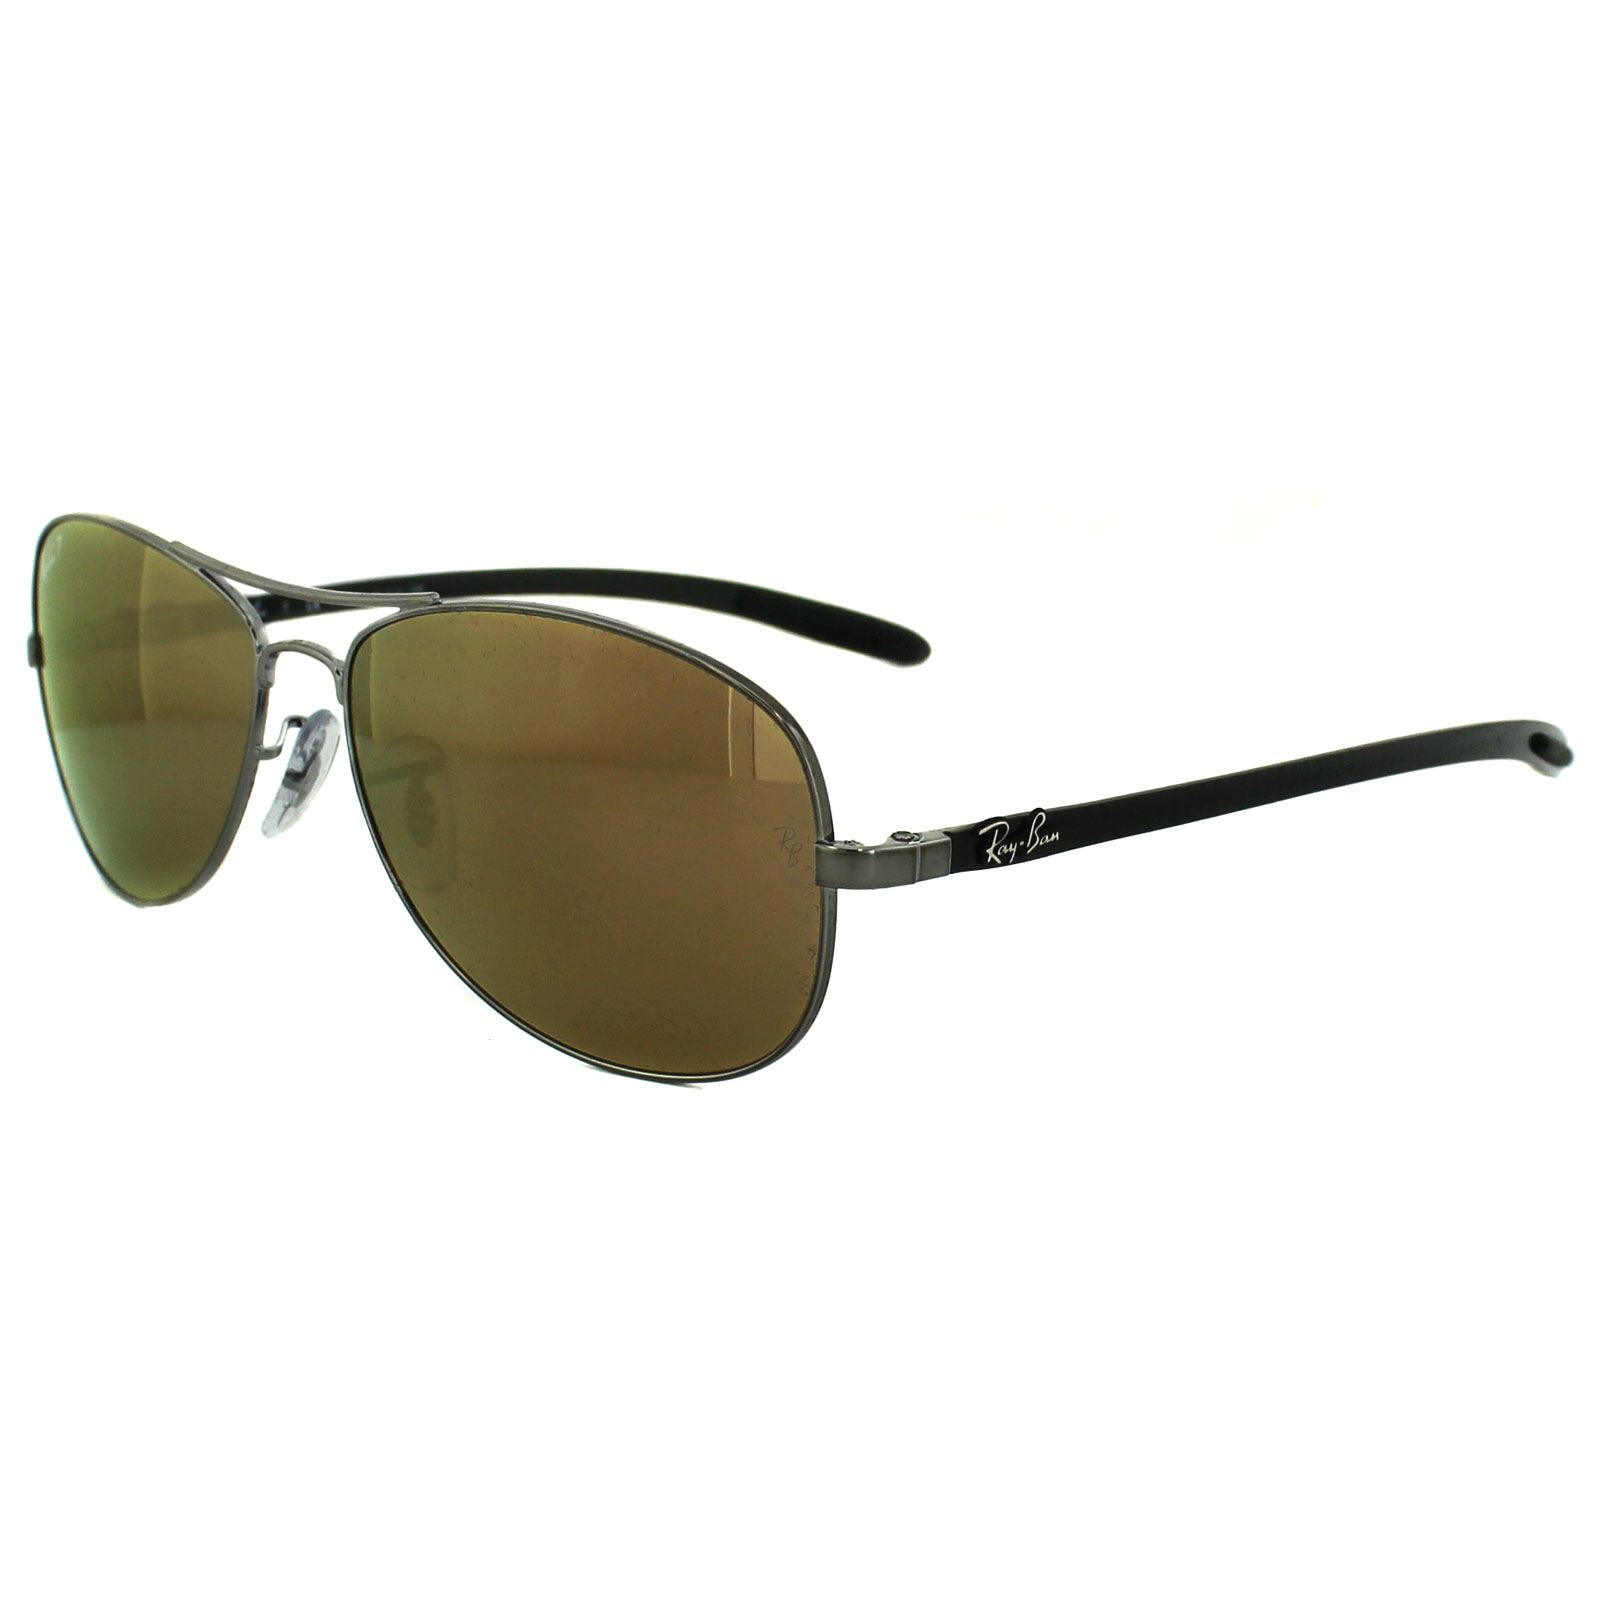 c40547fd30696 Sentinel Ray-Ban Sunglasses 8301 004 N3 Shiny Gunmetal Grey Brown Mirror  Gold Polarized